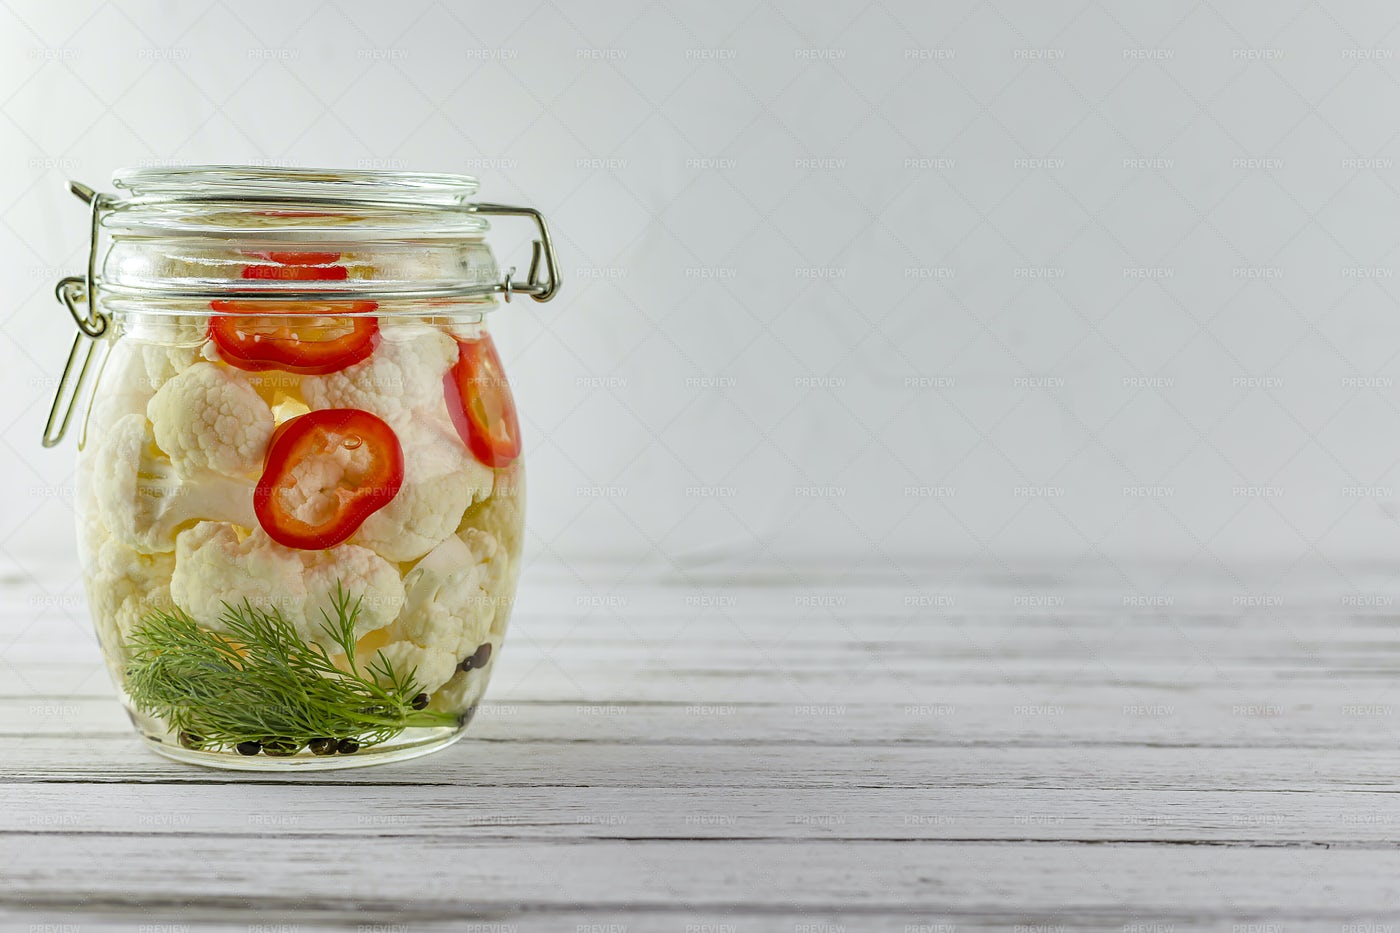 Glass Jar Of Fermented Cauliflower.: Stock Photos